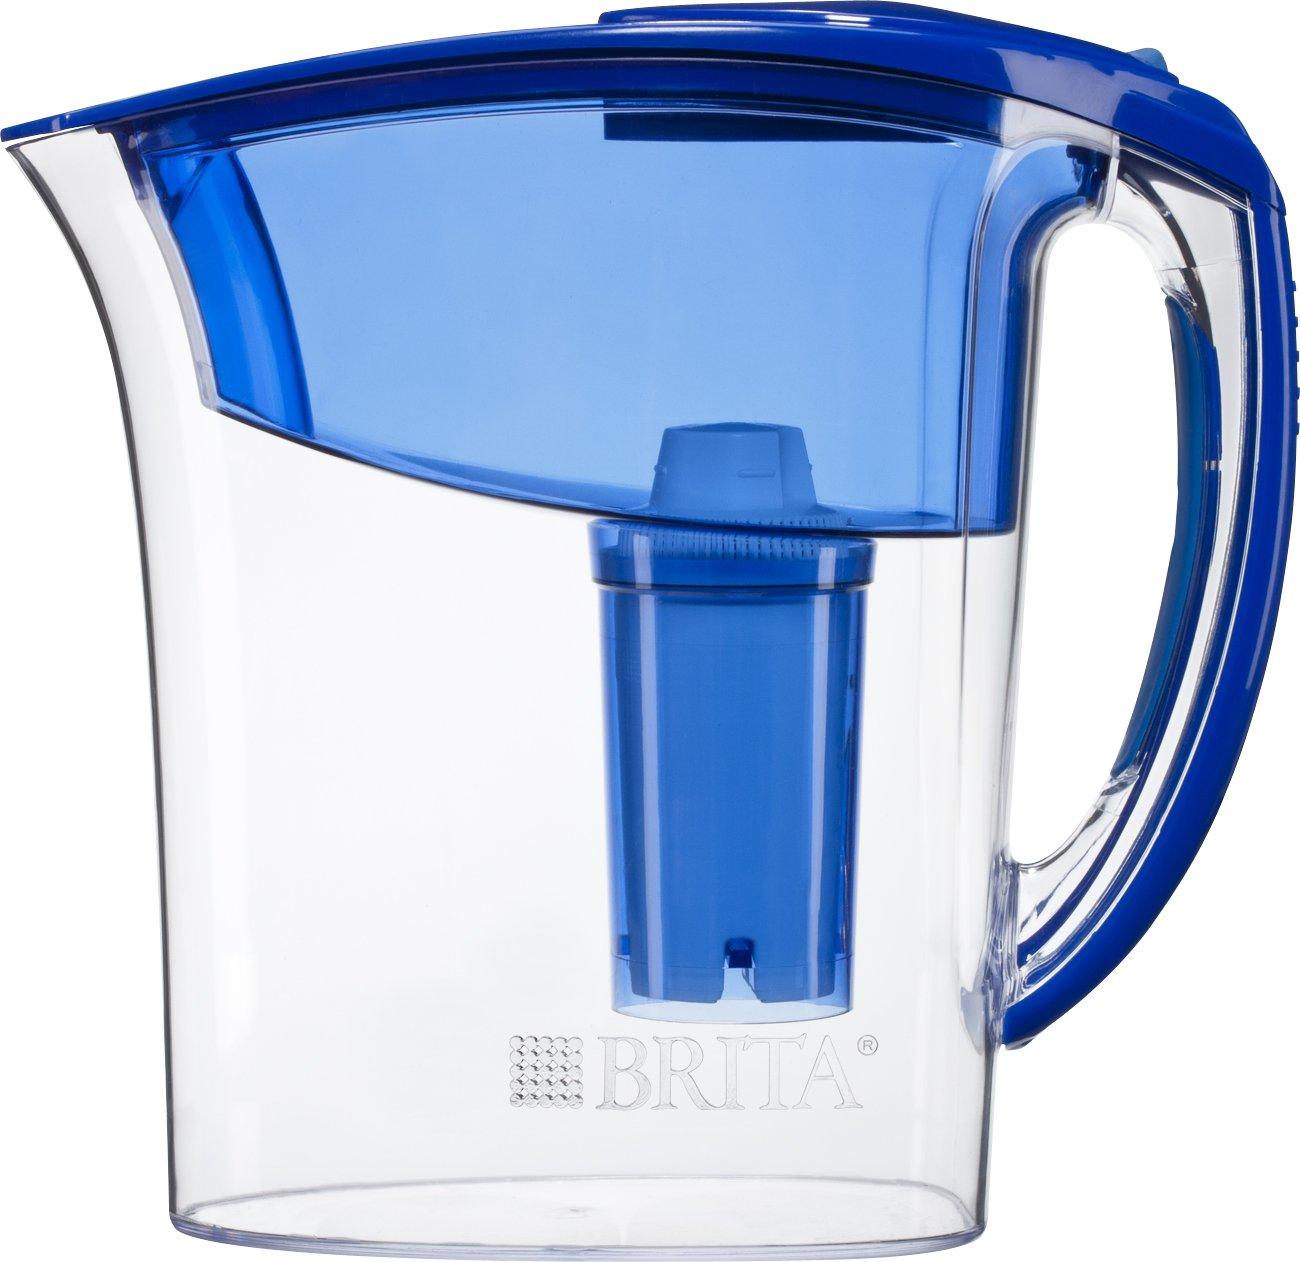 Brita atlantis water filter pitcher blue 6 cup new free shipping ebay - Brita carafe filtrante ...